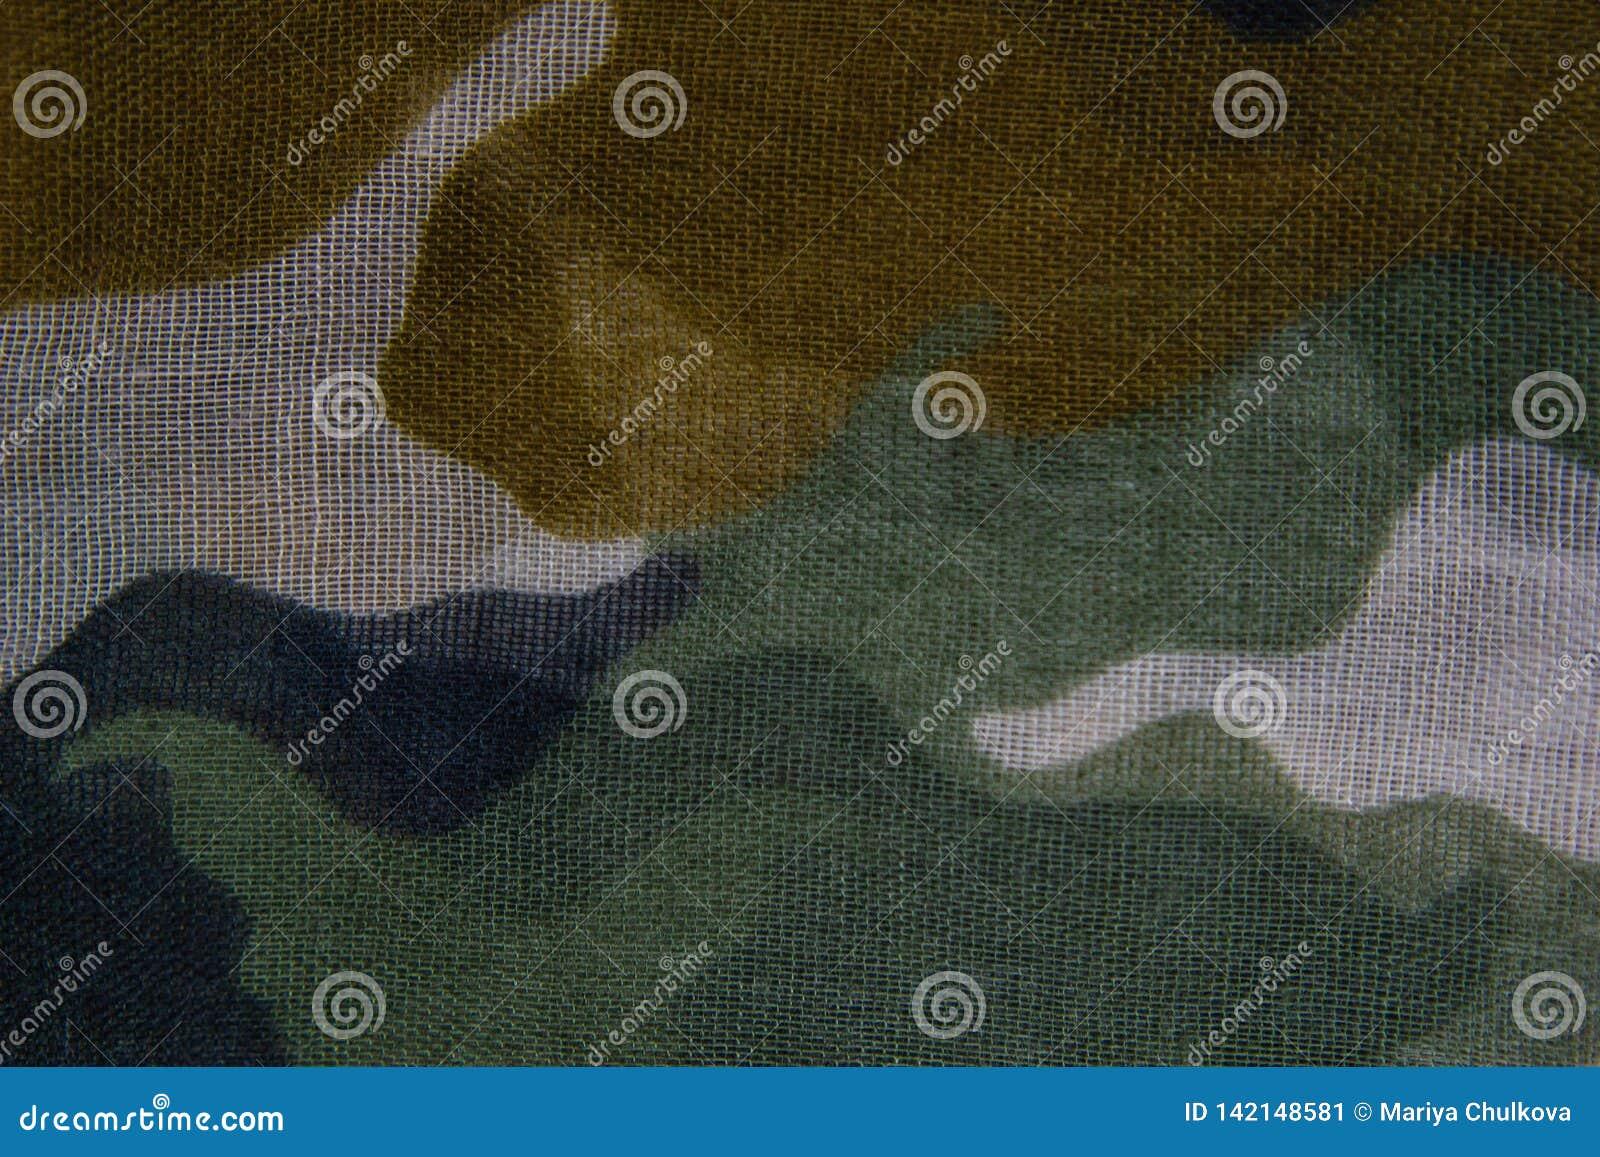 Kamuflaż deseniowa sukienna tekstura